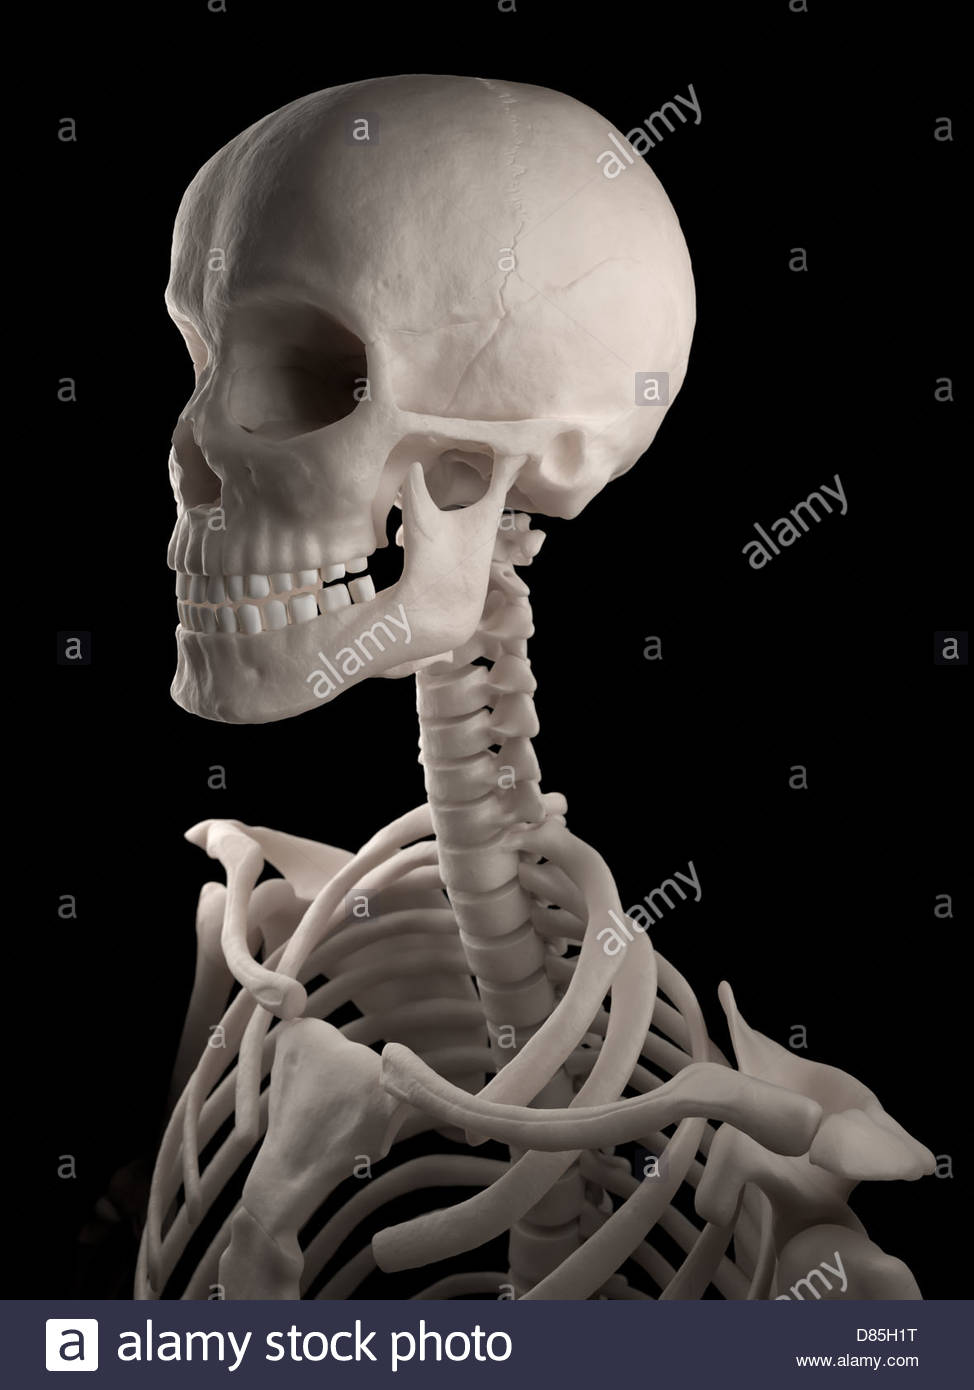 digital medical illustration: human skull, neck and upper torso, Skeleton